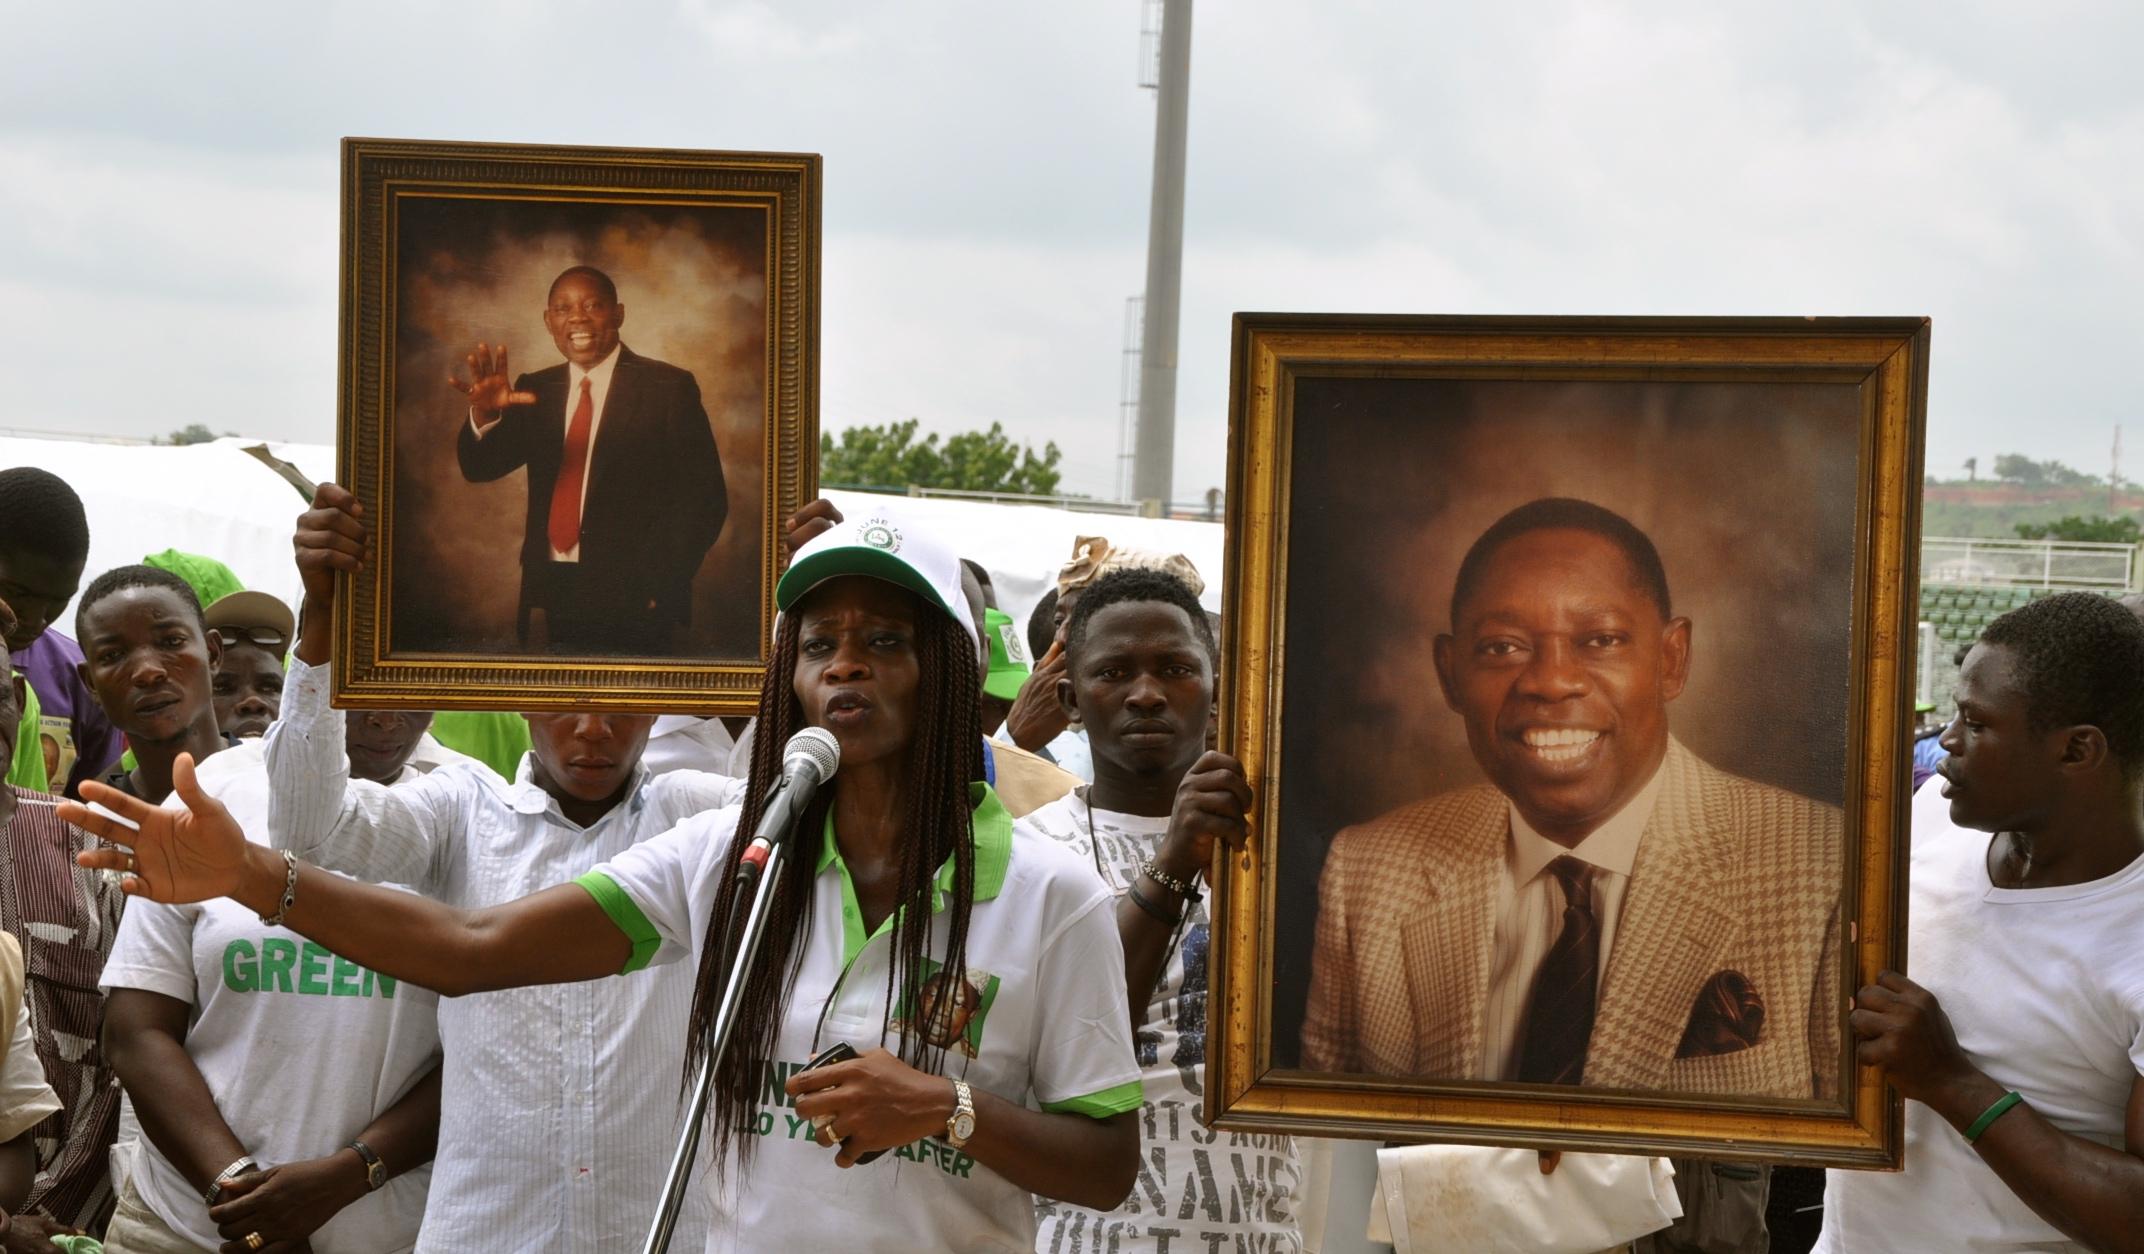 Why do Nigerians celebrate June 12th?